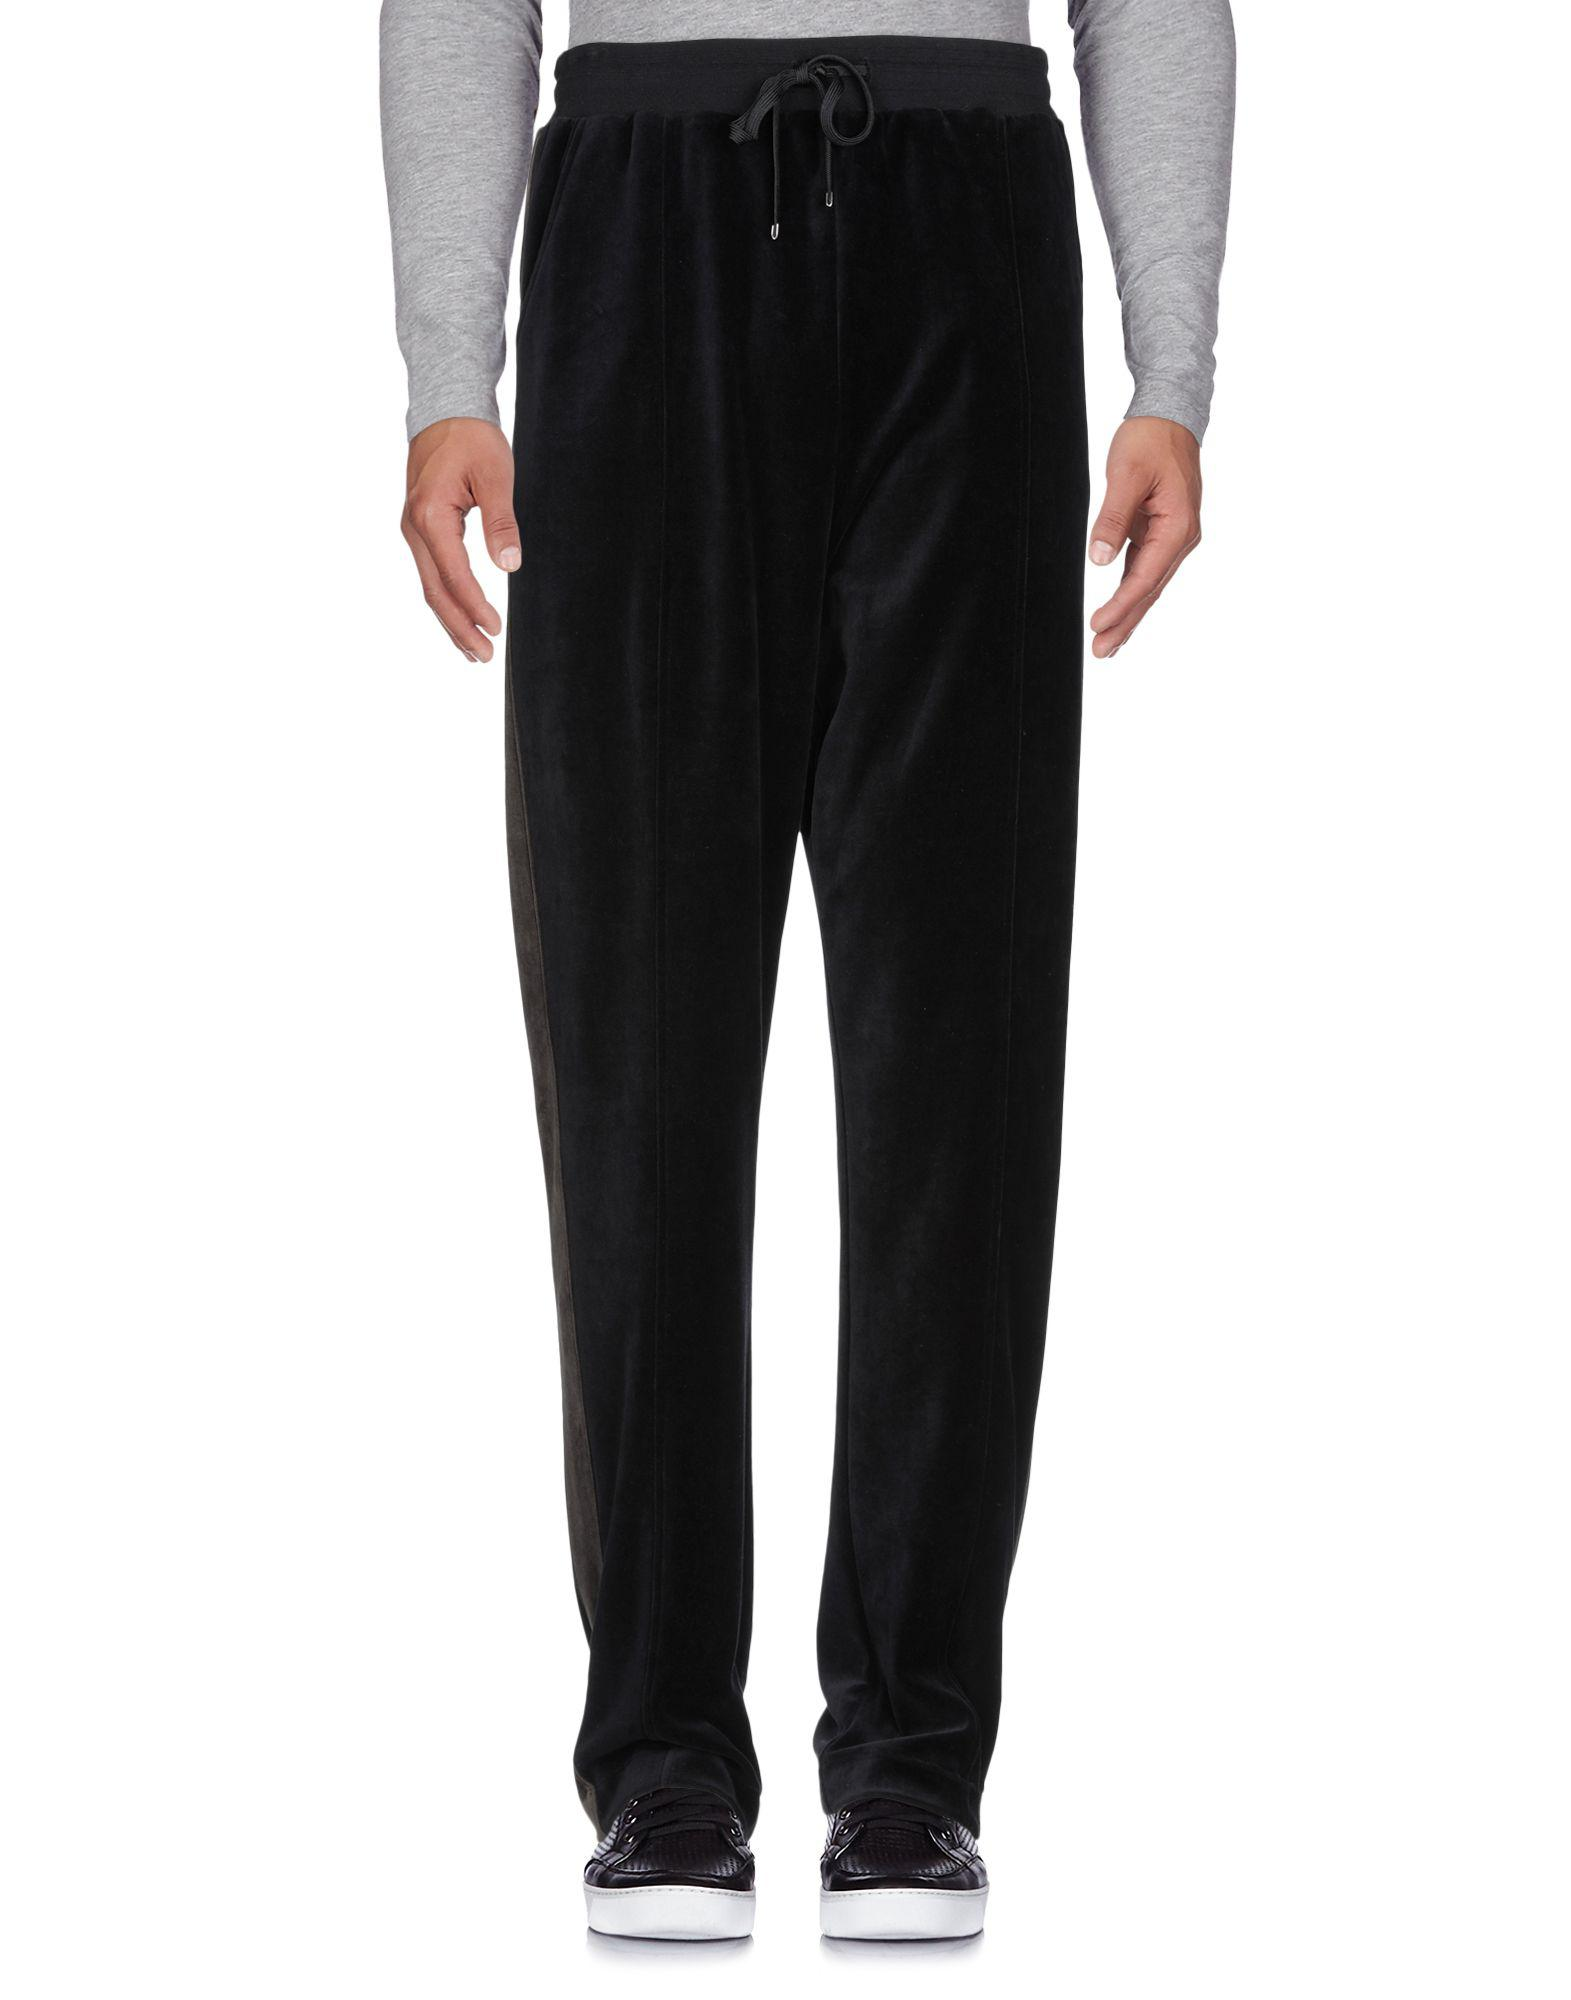 TROUSERS - Casual trousers Miharayasuhiro Eastbay l7Opc